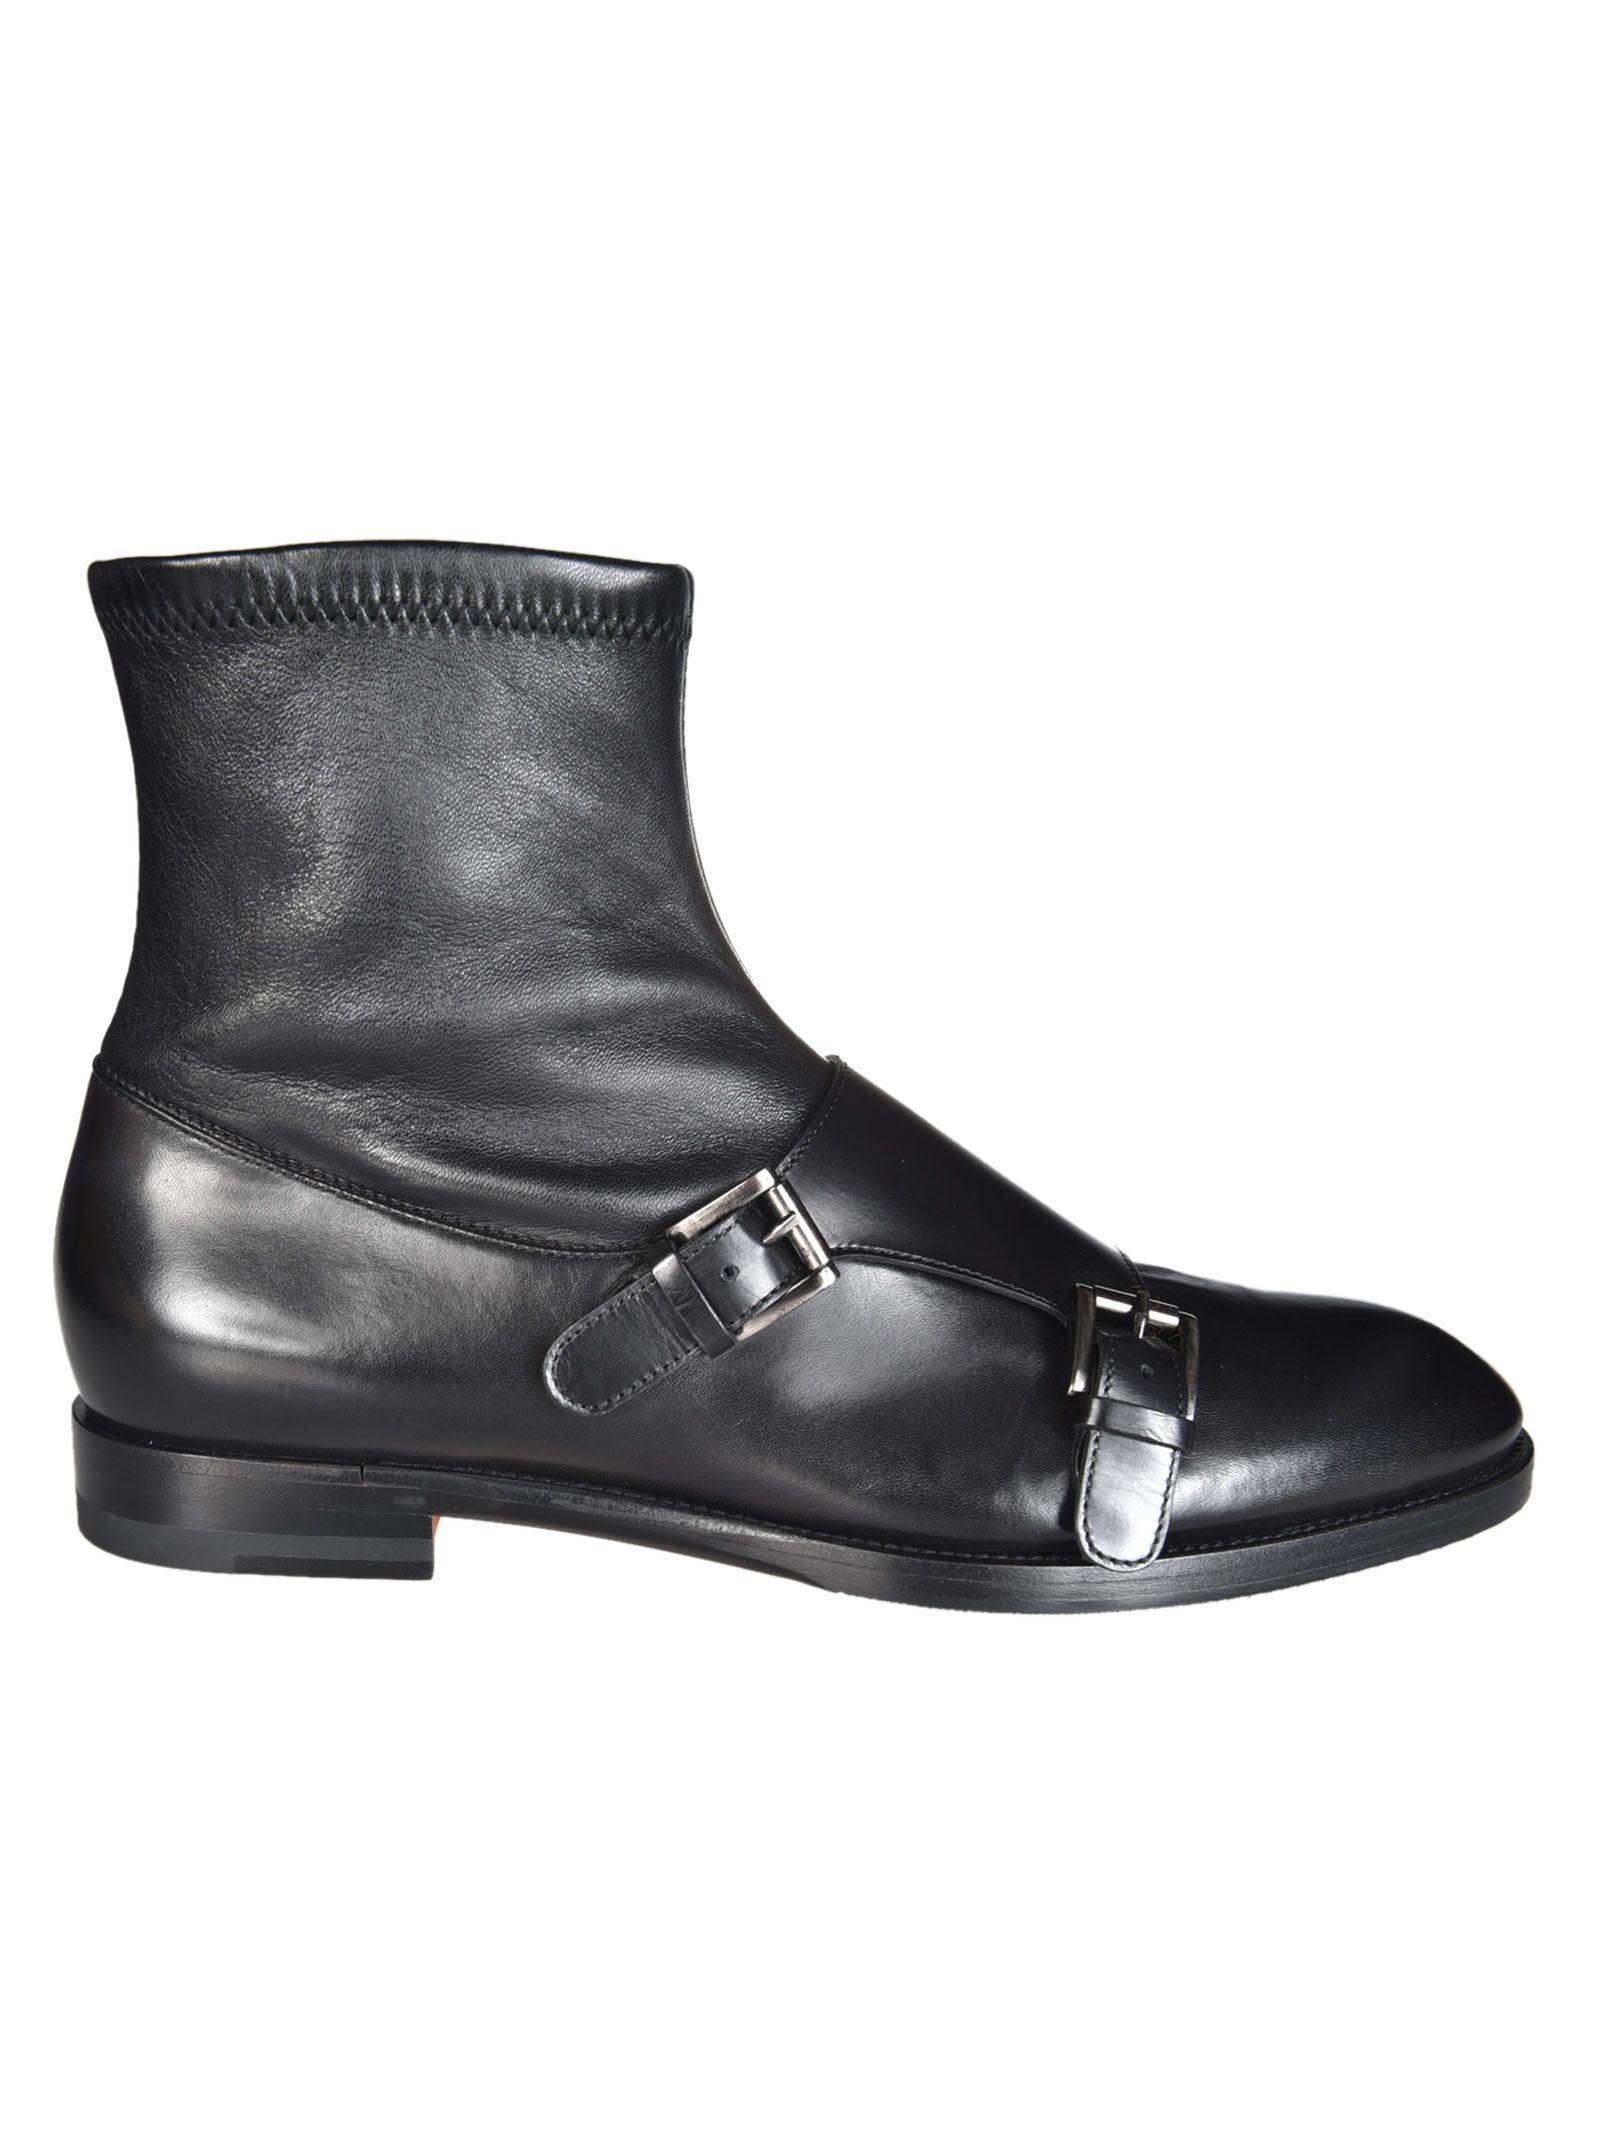 Santoni Monk Strap Boots